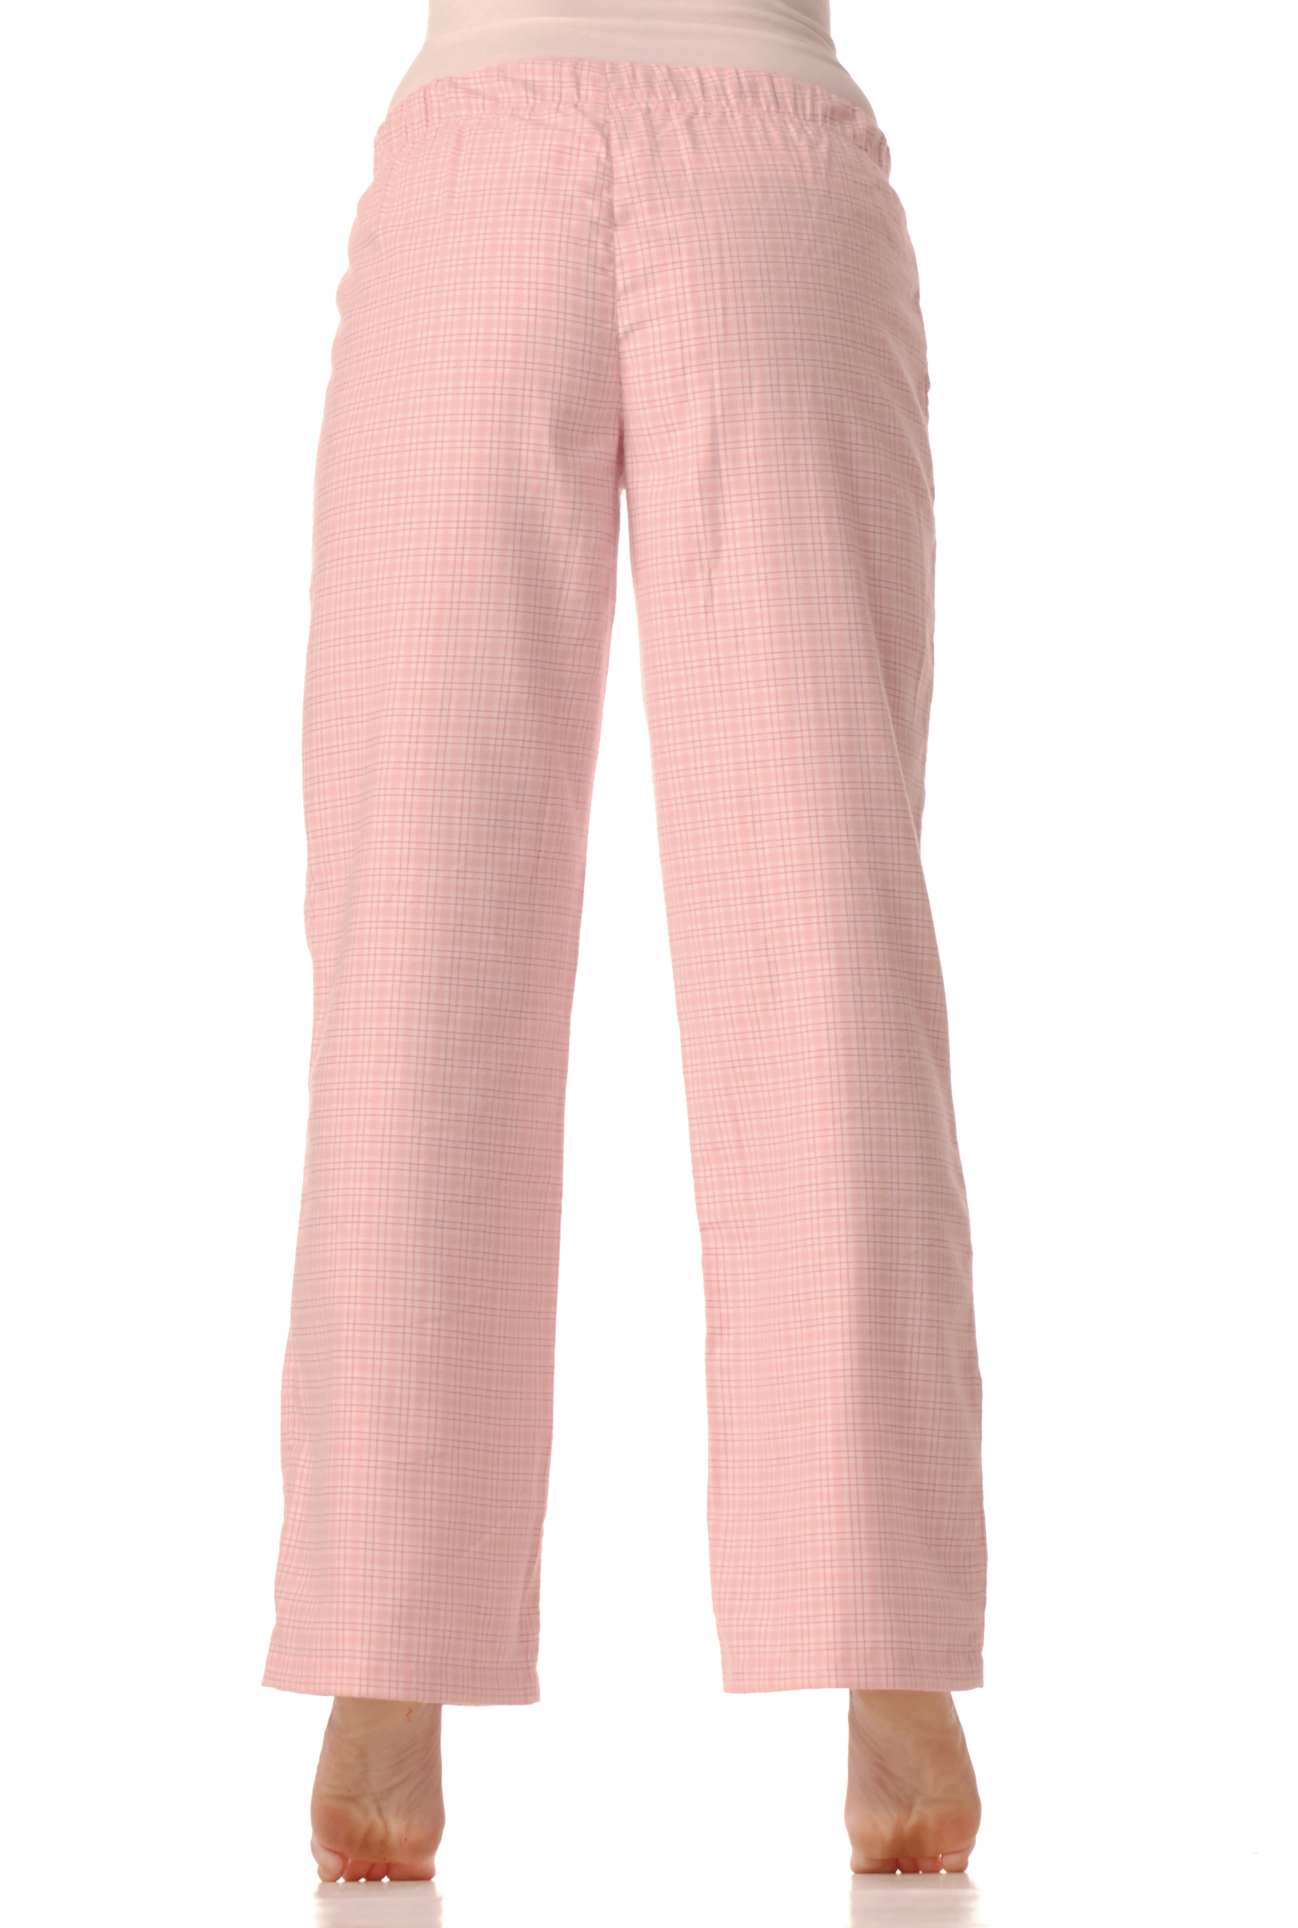 Flanelové pyžamové kalhoty - Růžová kostička